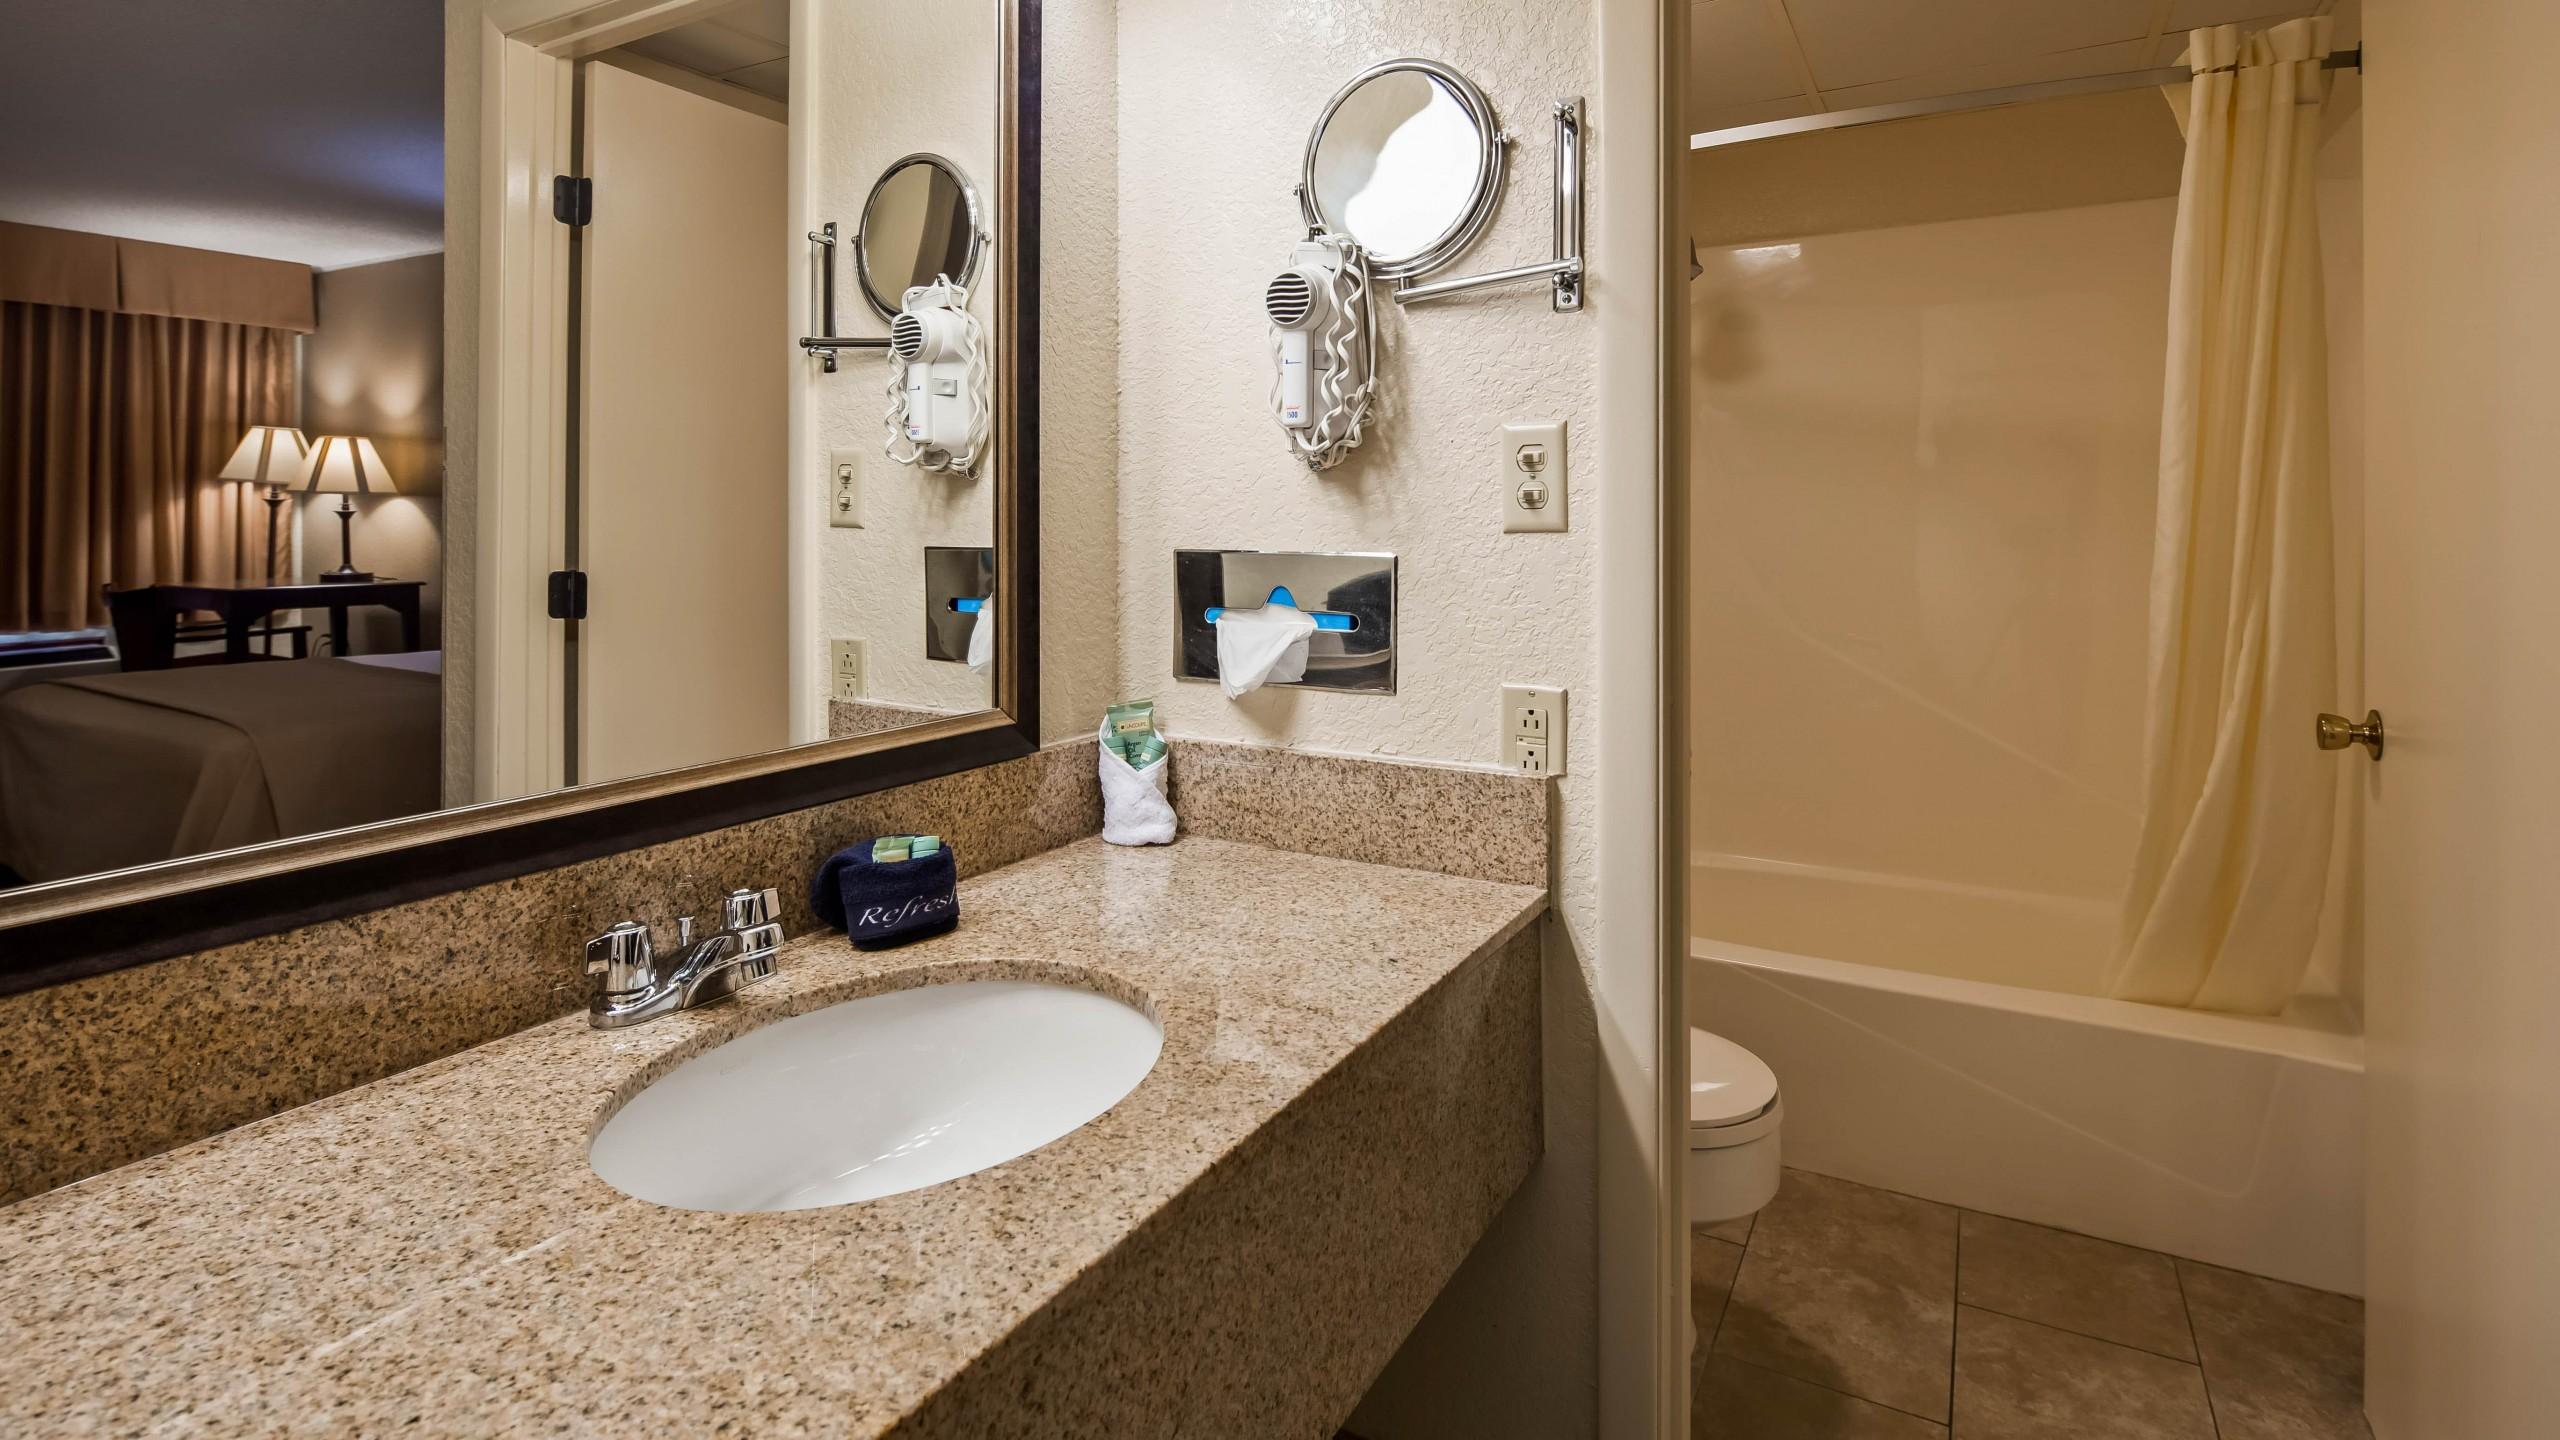 Best Western Center Pointe Inn king bathroom